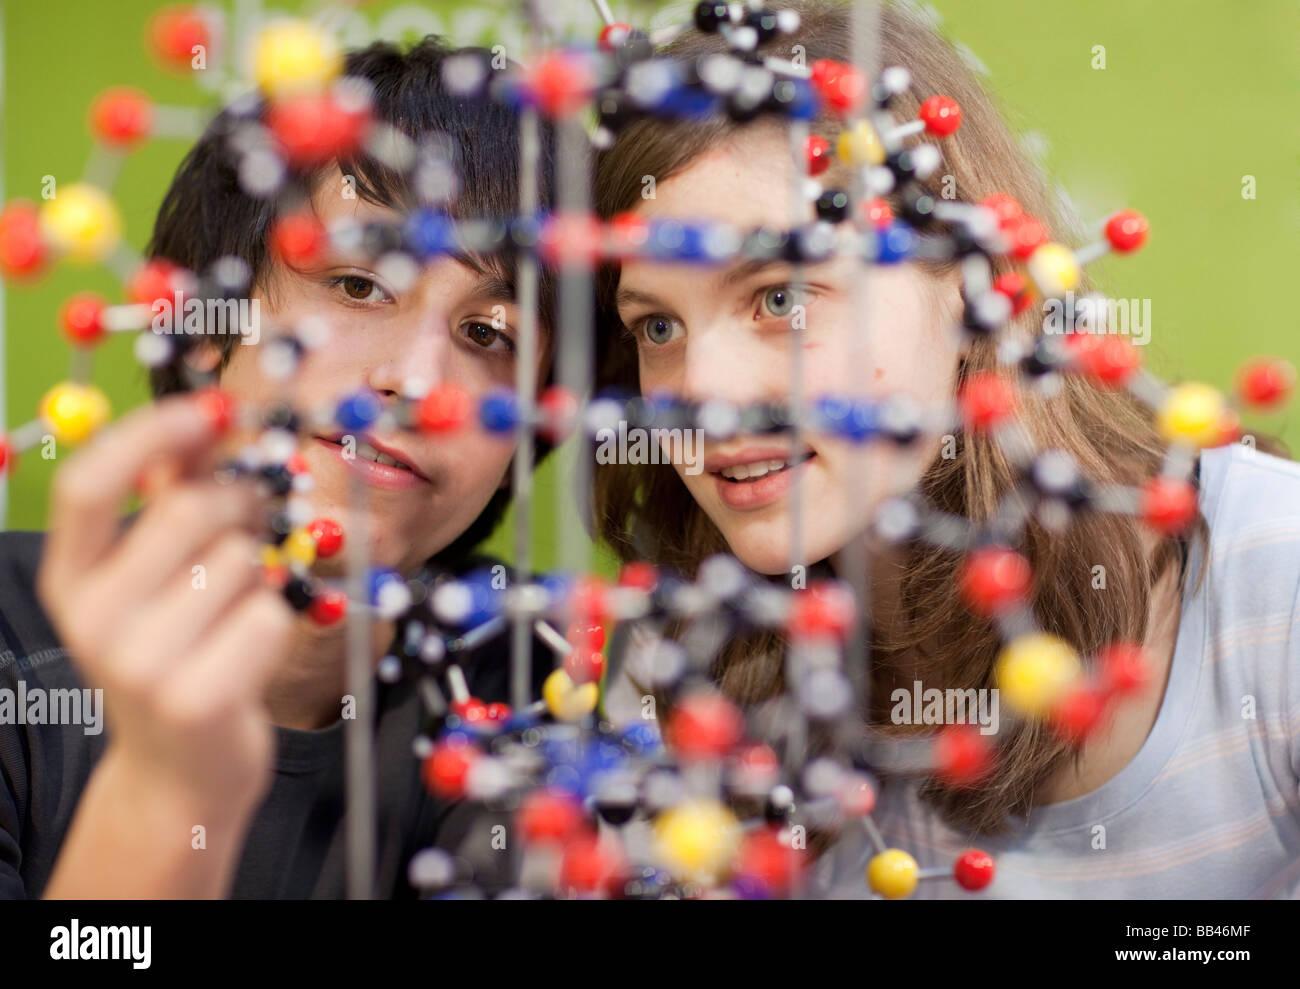 Studenten mit einem Atom-Modell Stockbild